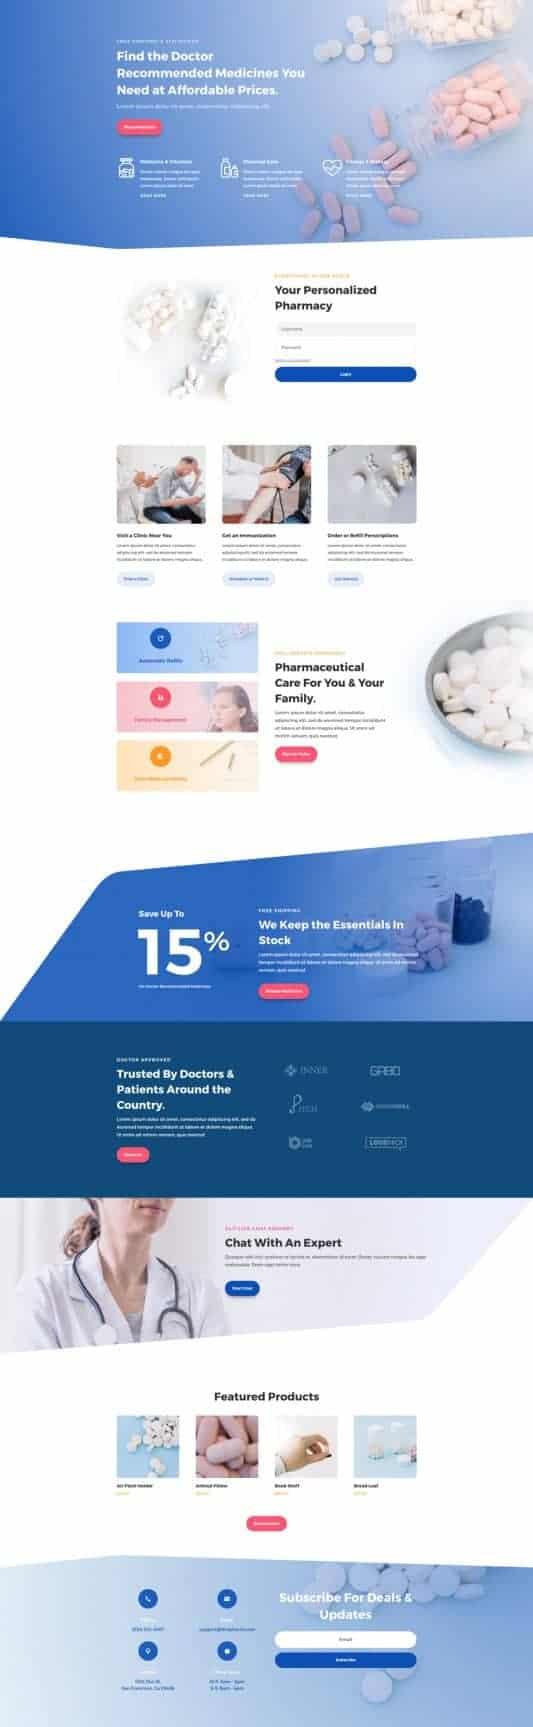 Pharmacy Web Design 4